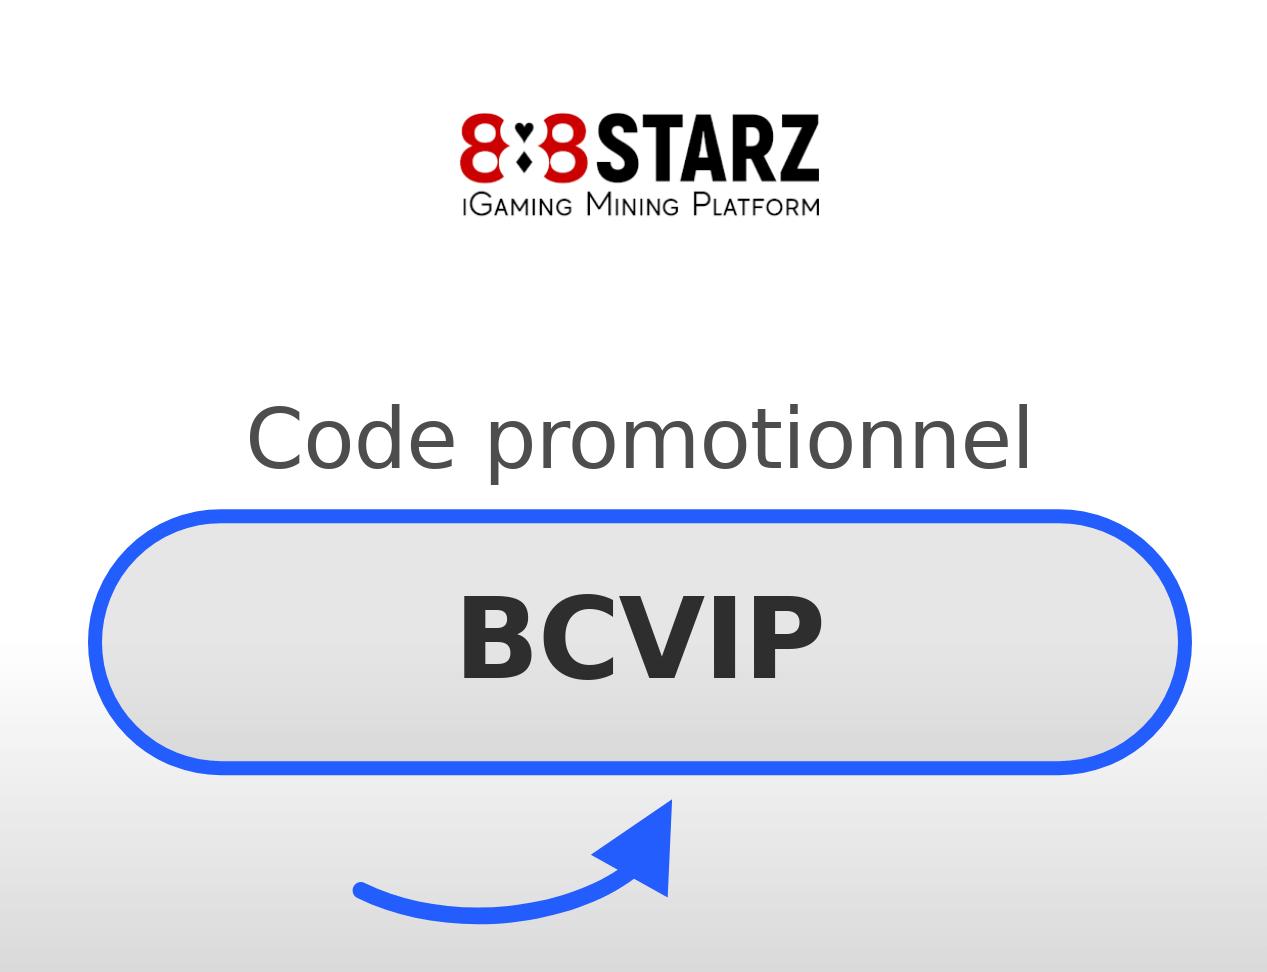 Code promotionnel 888starz